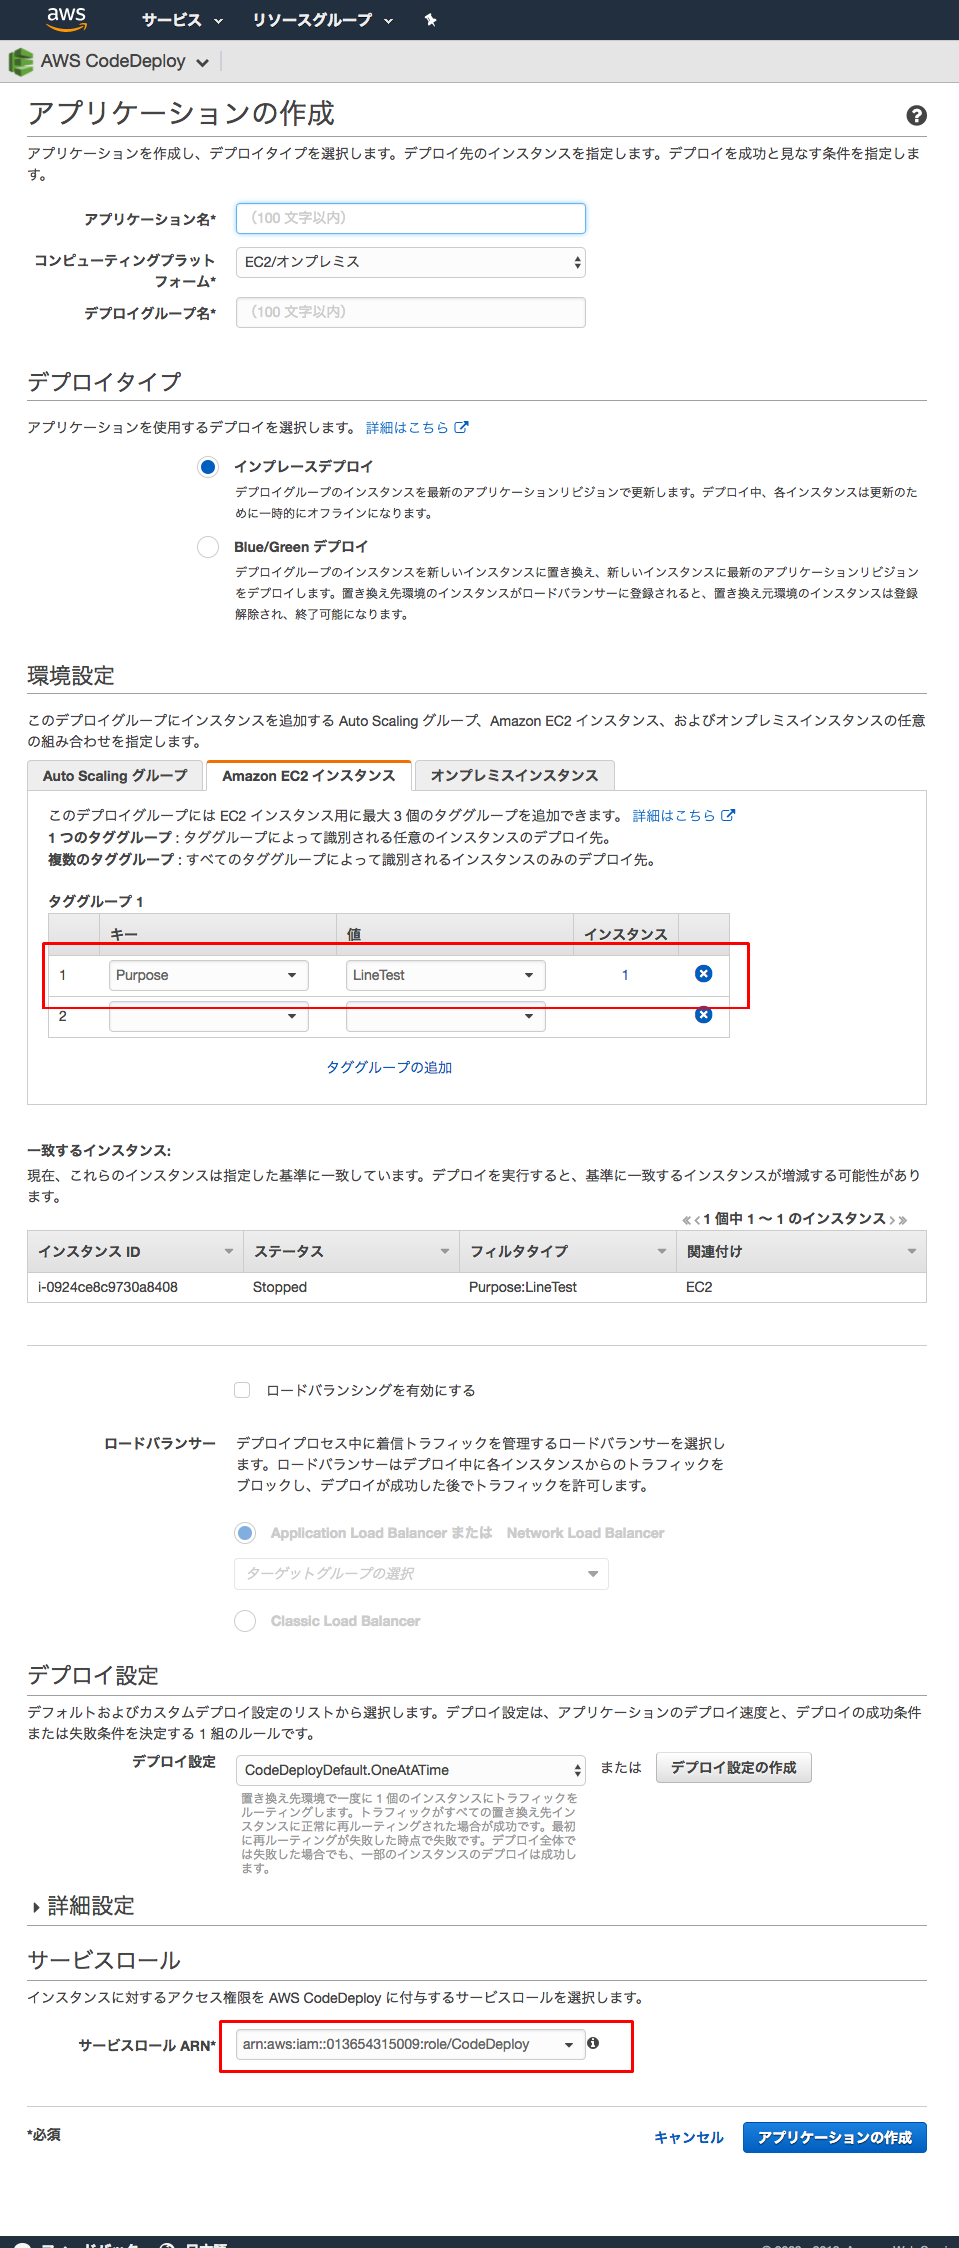 FireShot Capture 1 - AWS CodeDeploy_ - https___ap-northeast-1.png